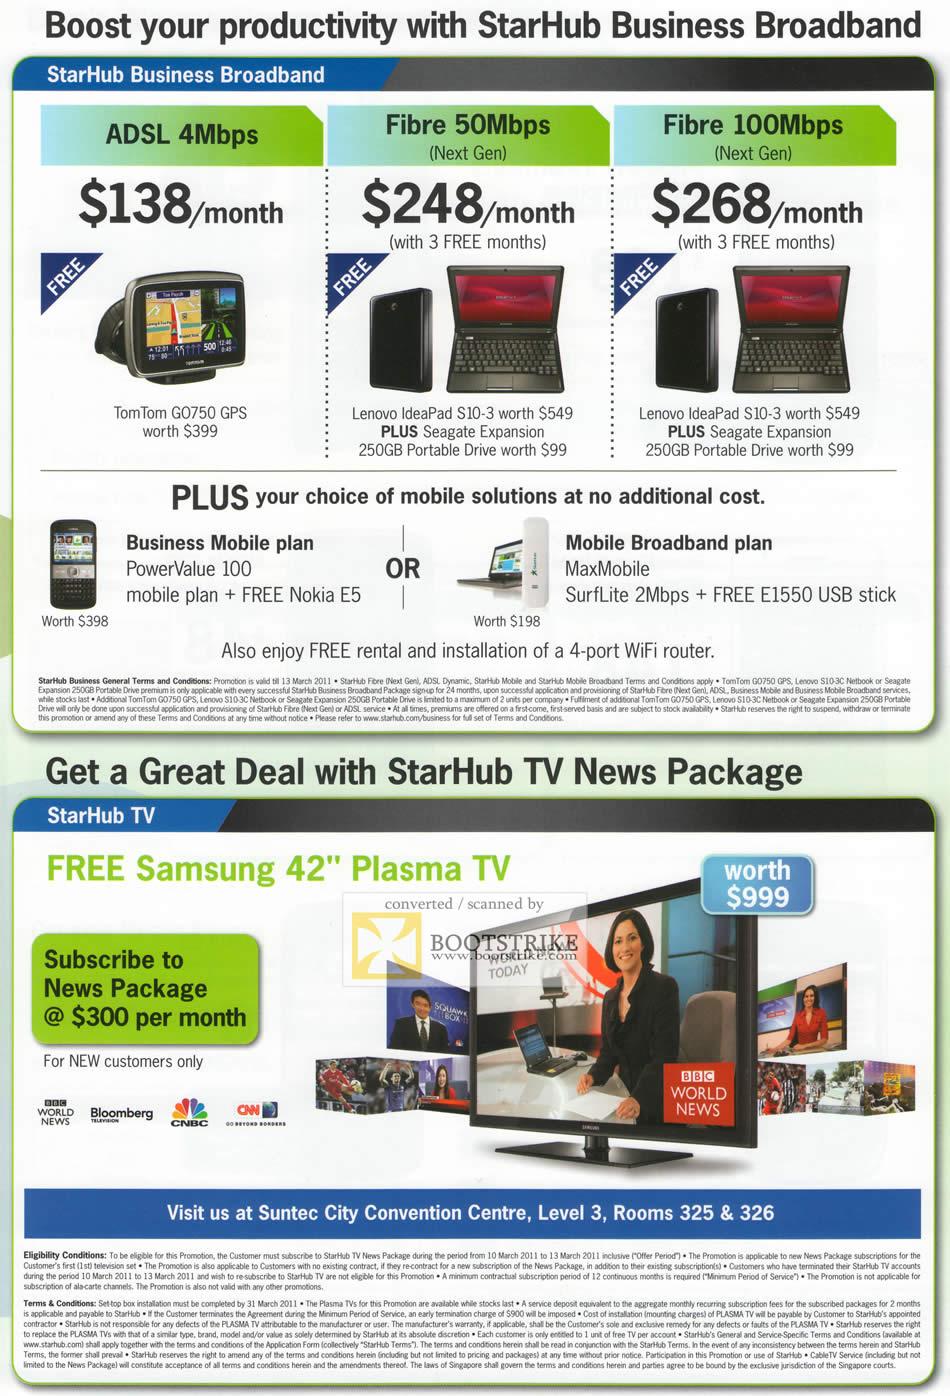 IT Show 2011 price list image brochure of Starhub Business Broadband ADSL Fibre TV News Plasma TV